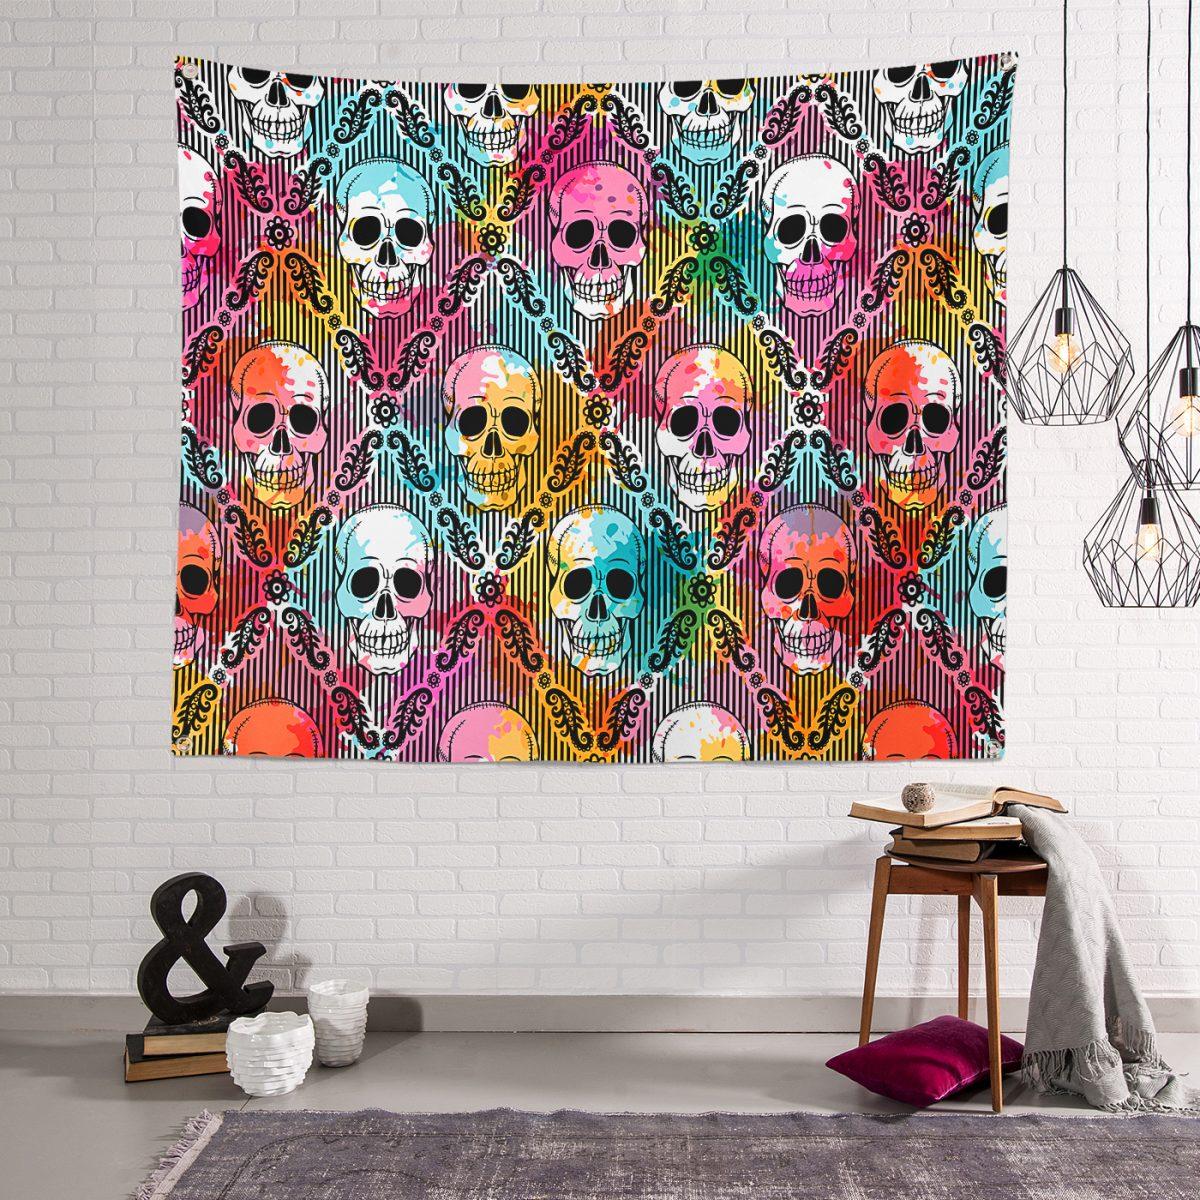 Realhomes Moda Renkli Zeminde Kurukafa Motifli Dijital Baskılı Modern Tapestry Duvar Örtüsü Realhomes